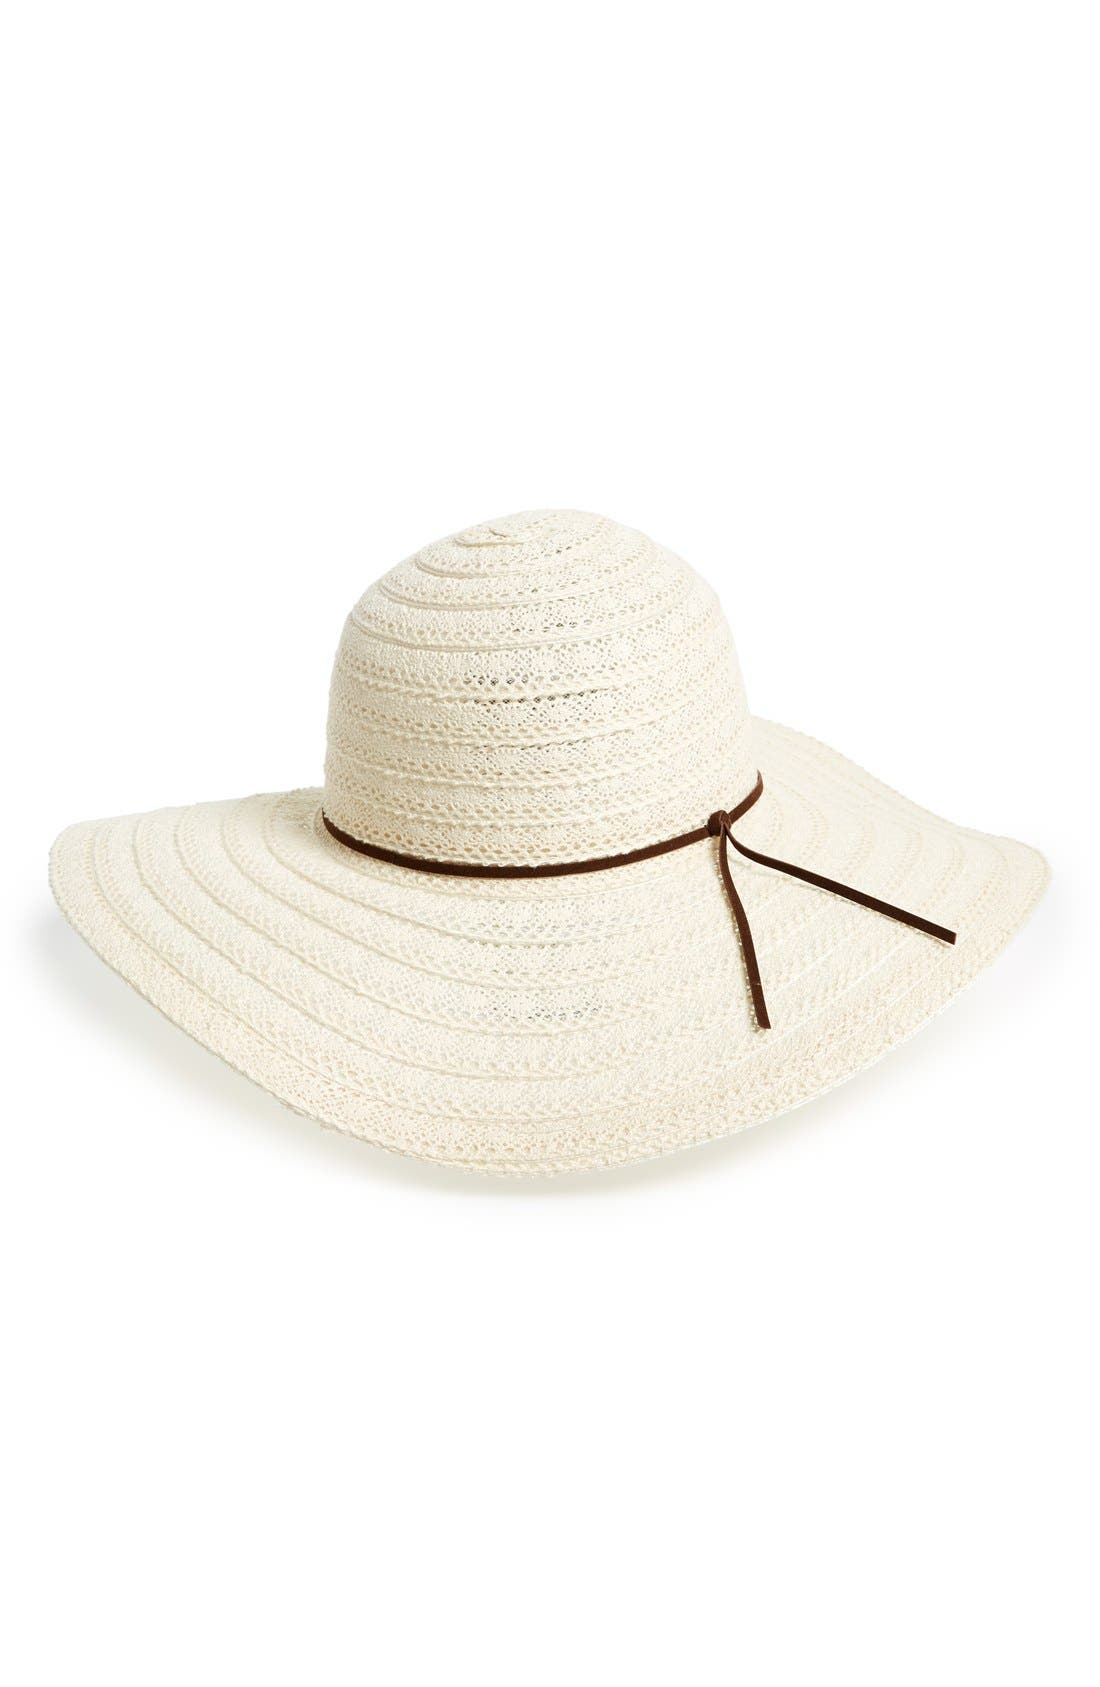 Alternate Image 1 Selected - Emanuel Geraldo Floppy Lace Hat